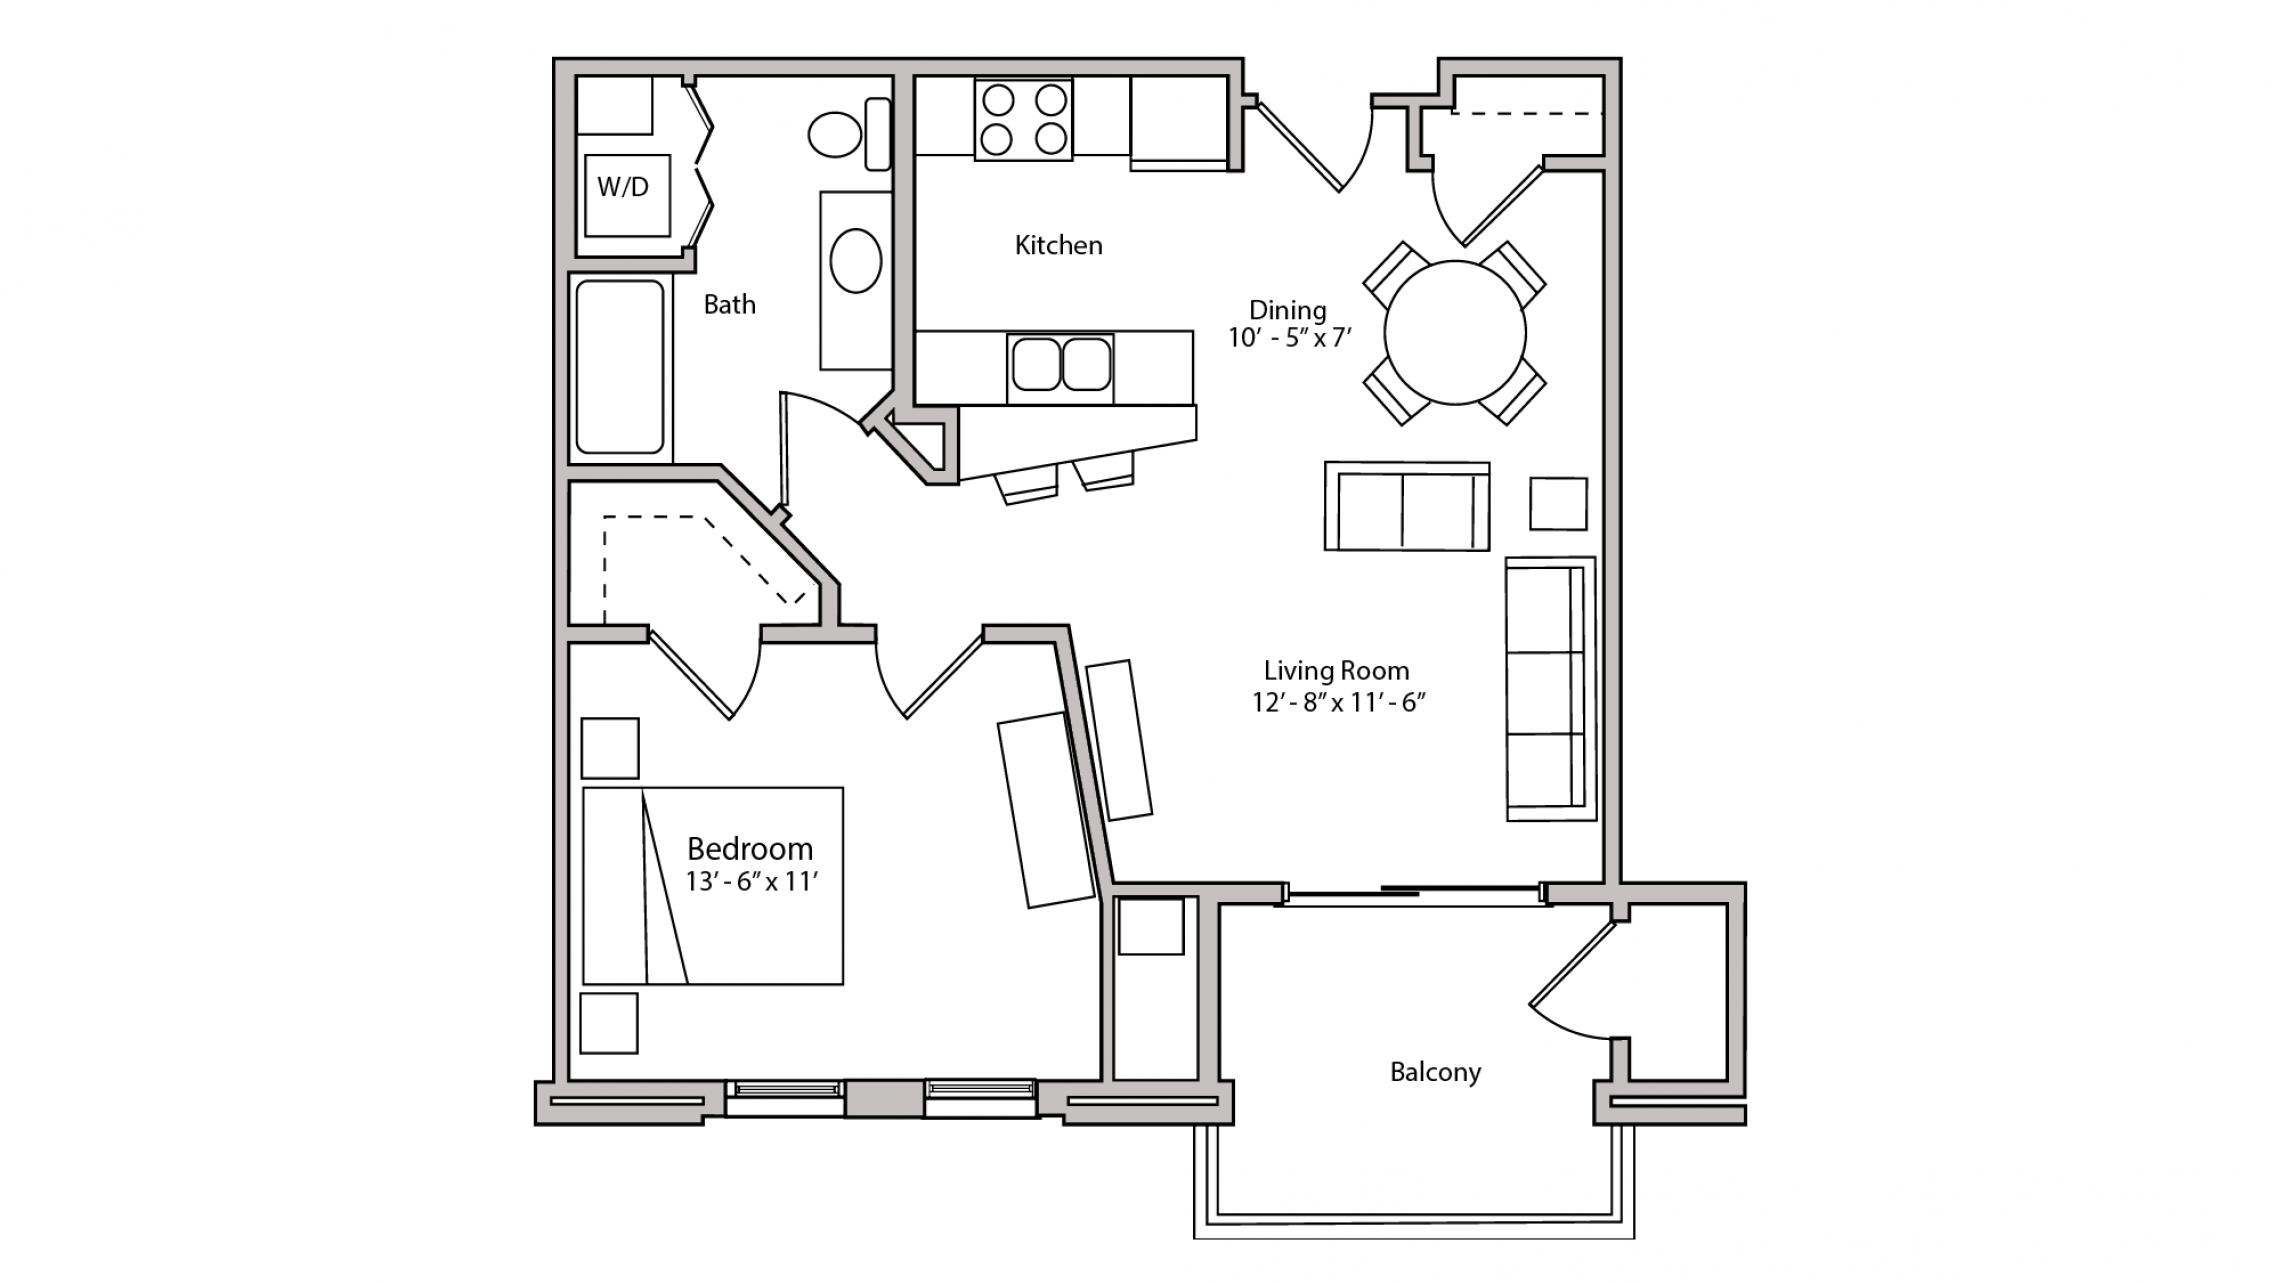 ULI The Depot 2-306 - One Bedroom, One Bathroom